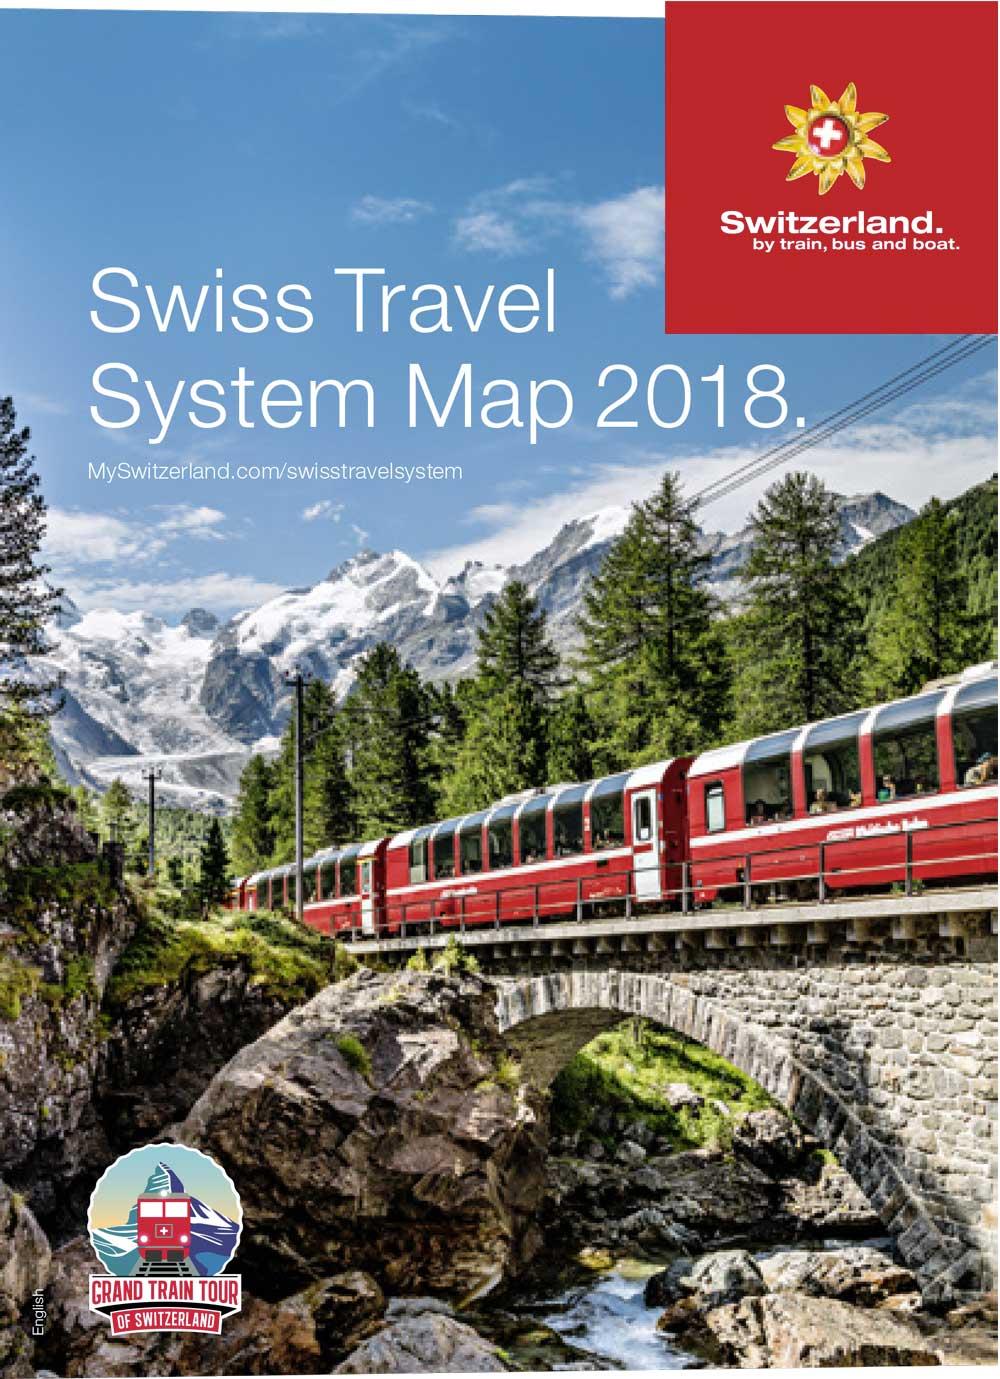 Swiss Travel System Map 2018